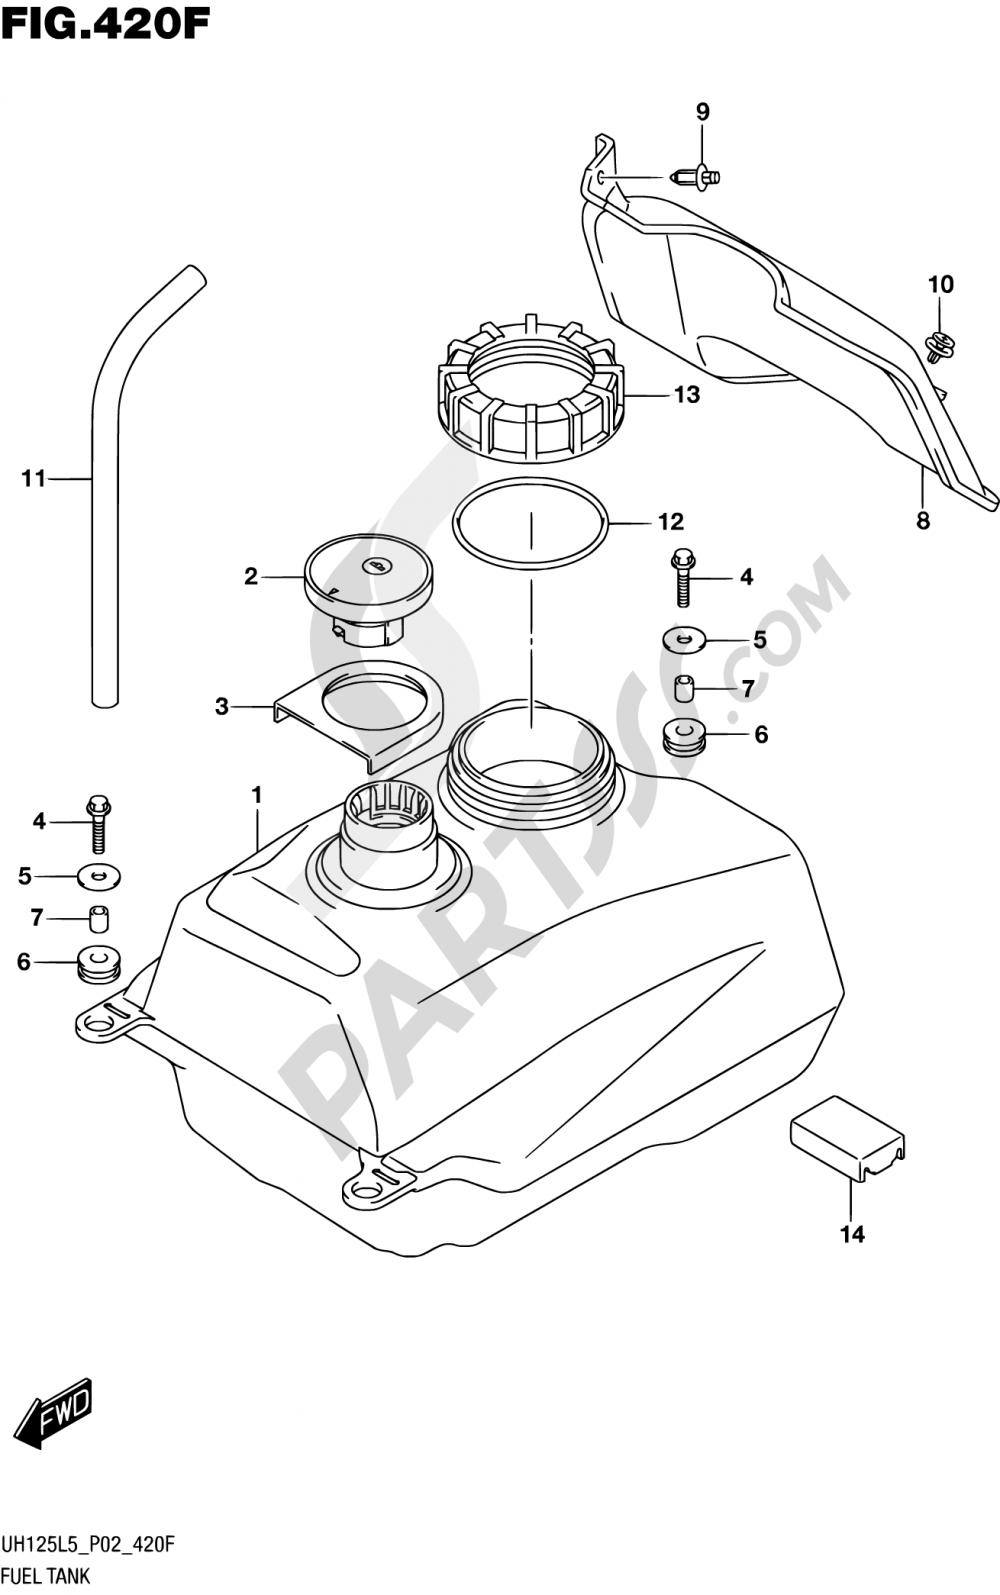 420F - FUEL TANK (UH125AL5 P19) Suzuki BURGMAN UH125 2015